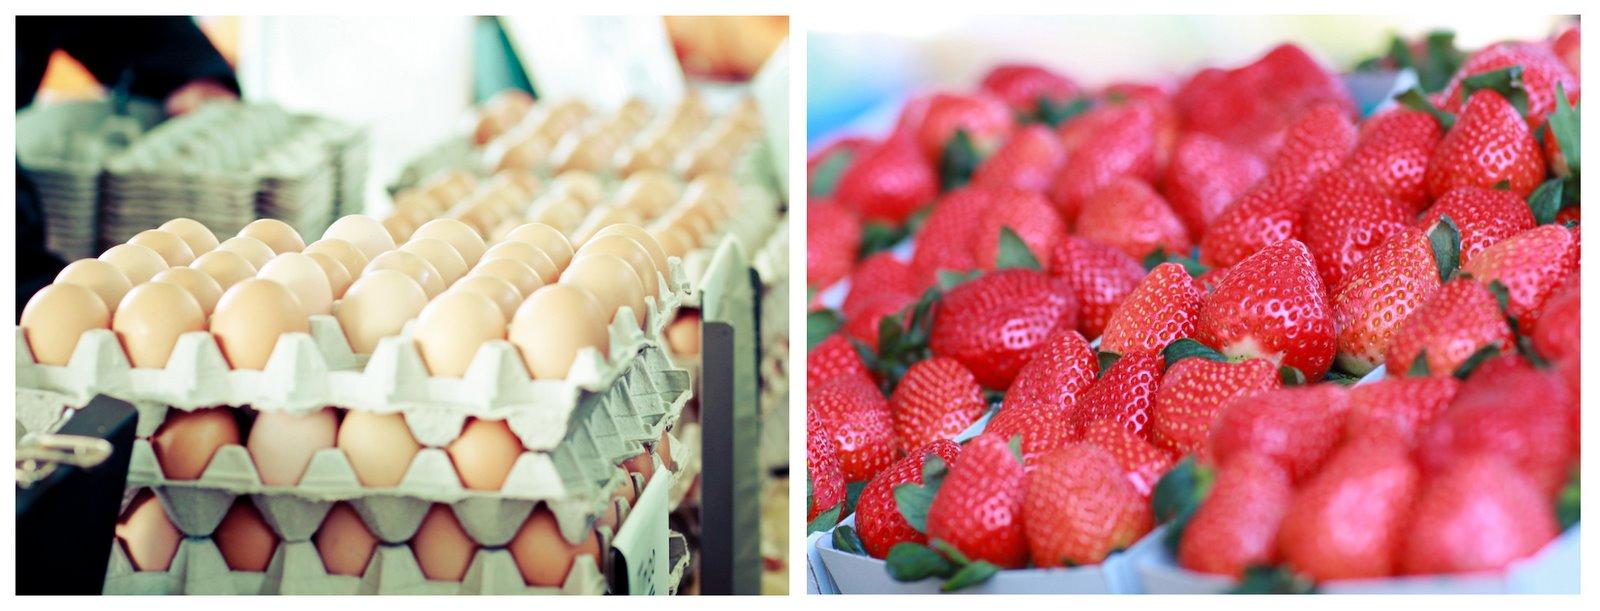 Davis Farmers Market Strawberries Eggs